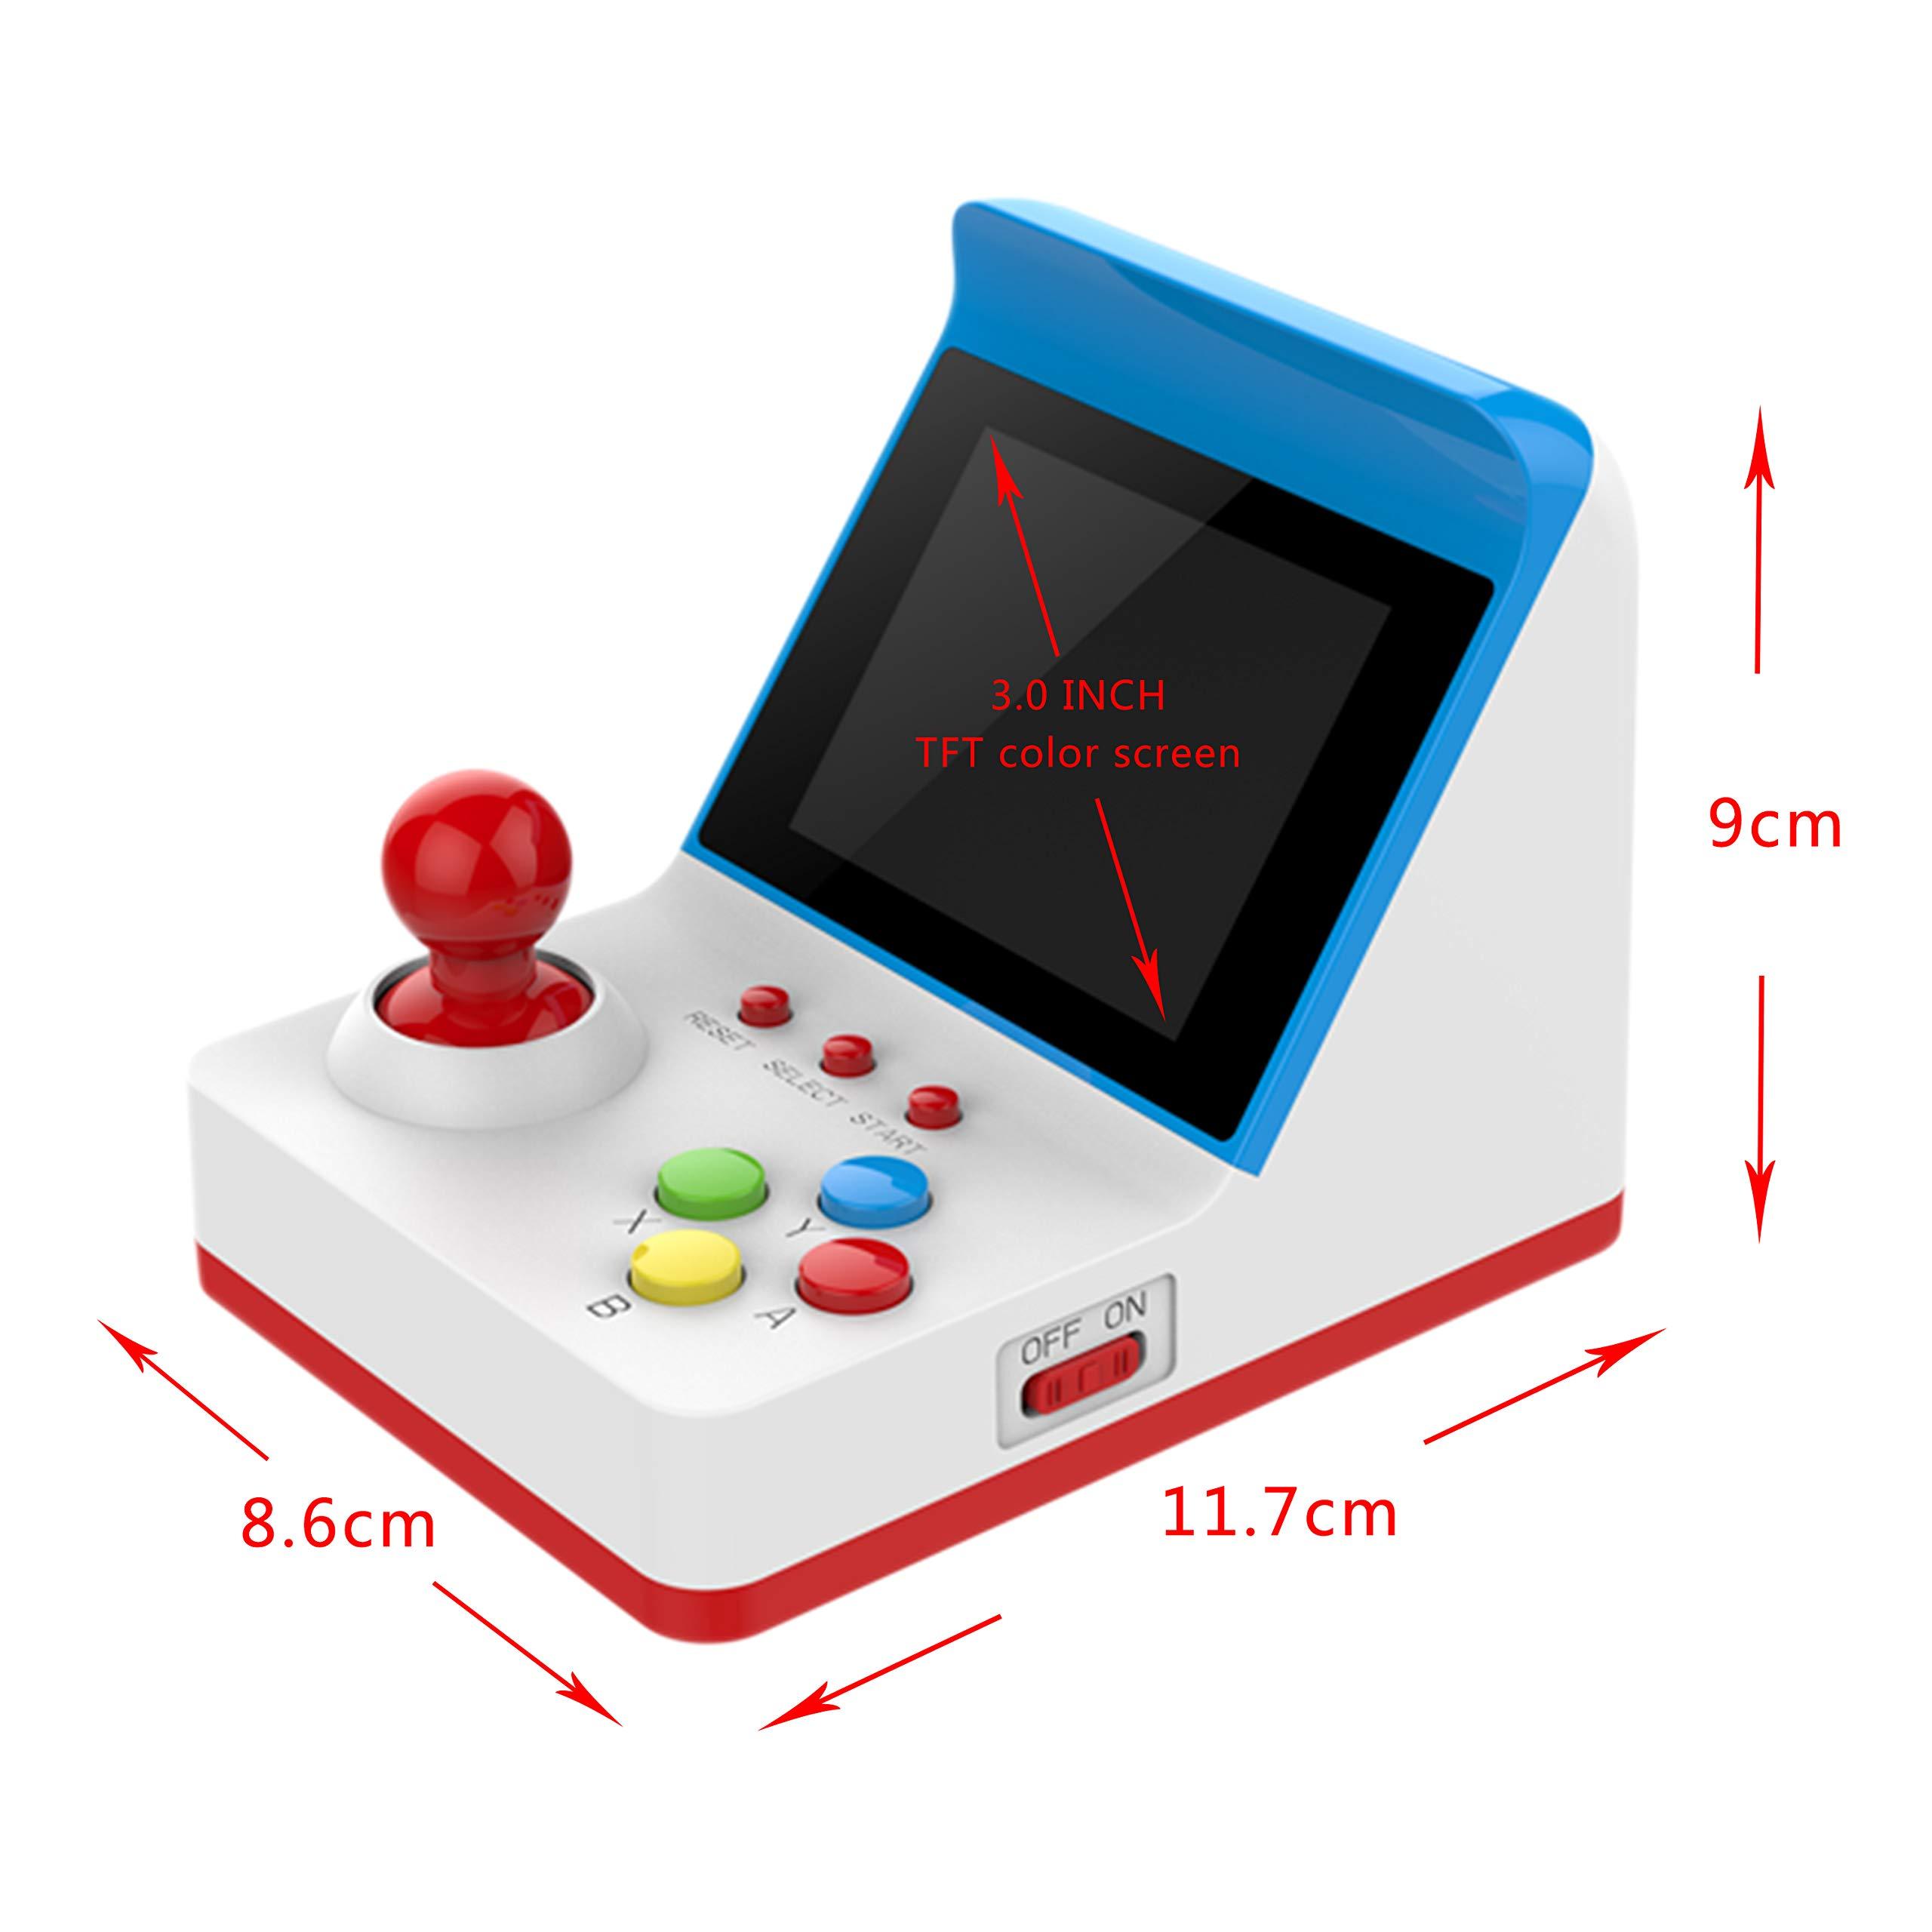 BAORUITENG Handheld Game Console, Retro FC Game Console Video Game Console with 3 Inch 360 Classic Games with 2 Joysticks , Birthday Present for Children (red) by BAORUITENG (Image #5)